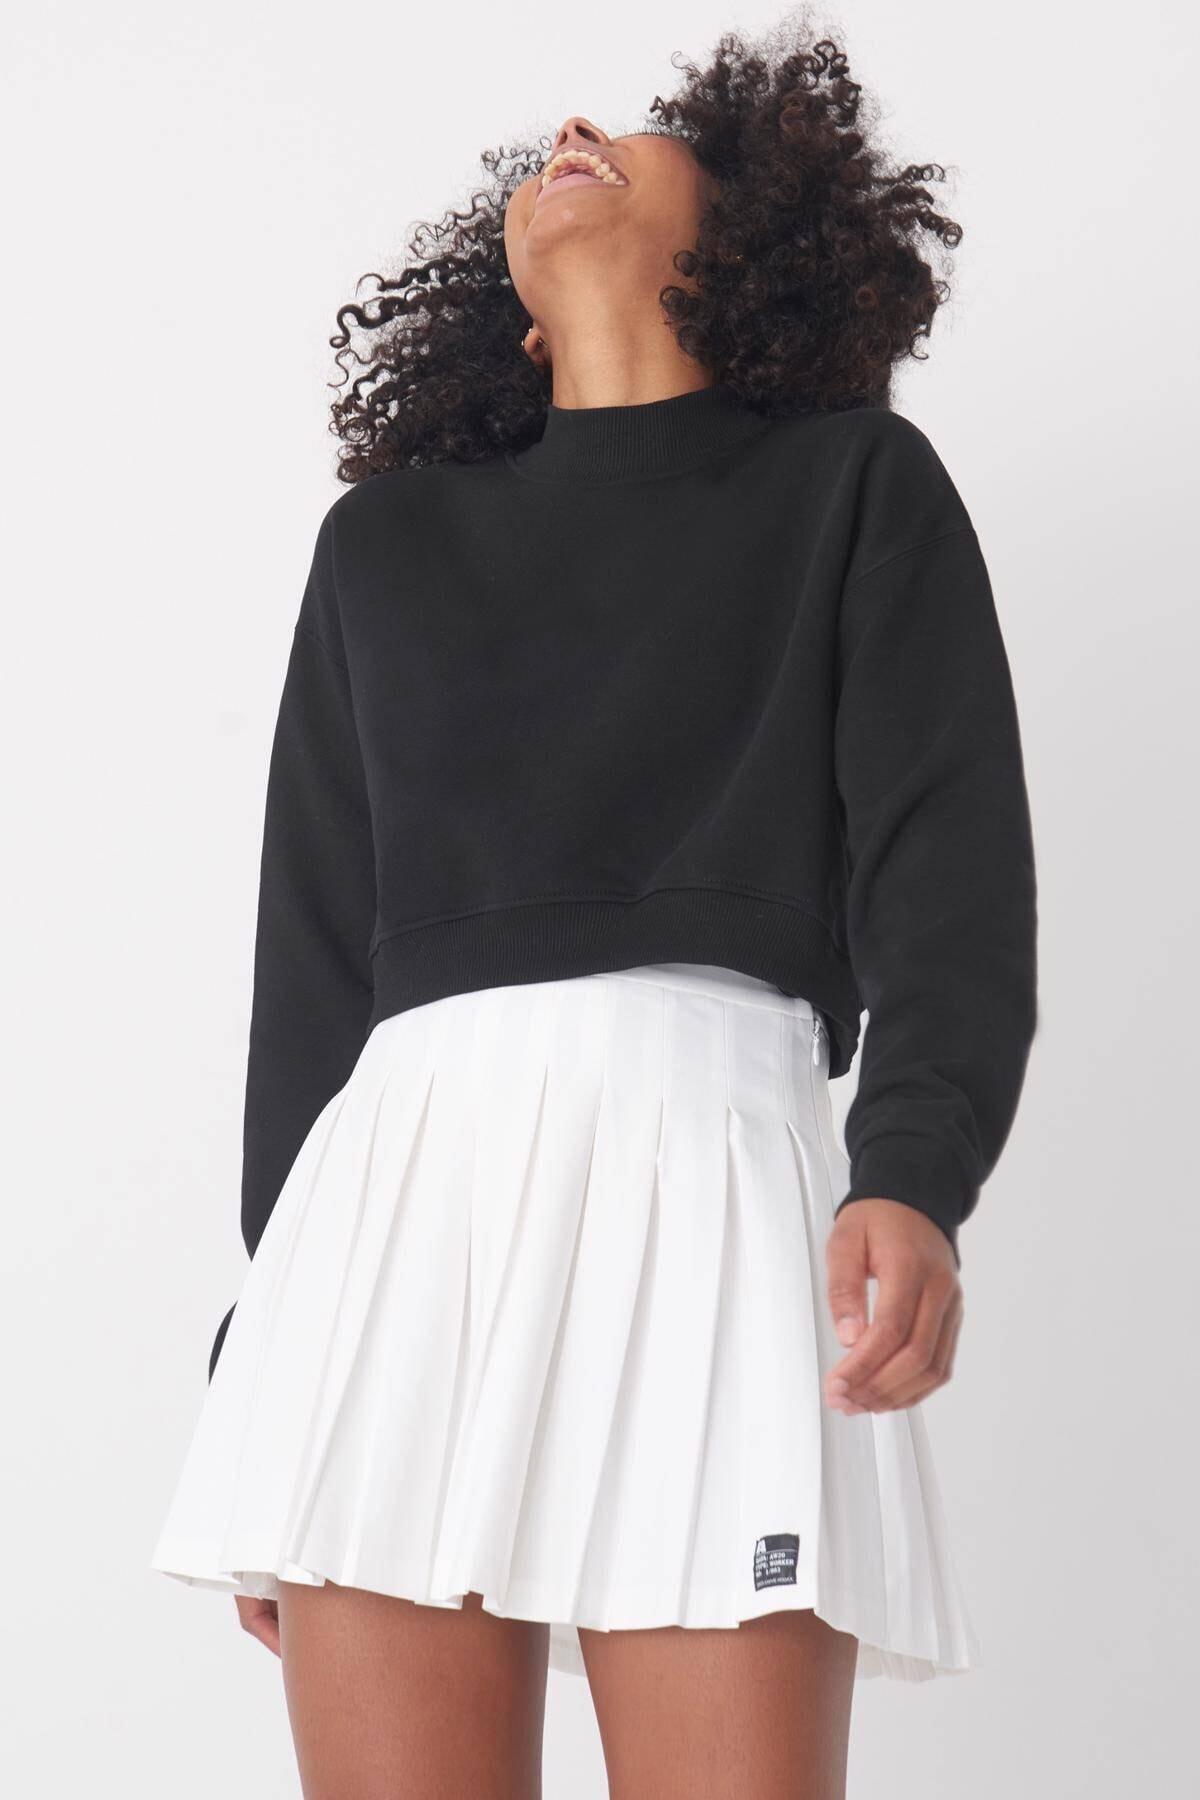 Addax Kadın Siyah Yarım Balıkçı Yaka Kısa Sweatshirt S8625 - B9 ADX-0000020605 2